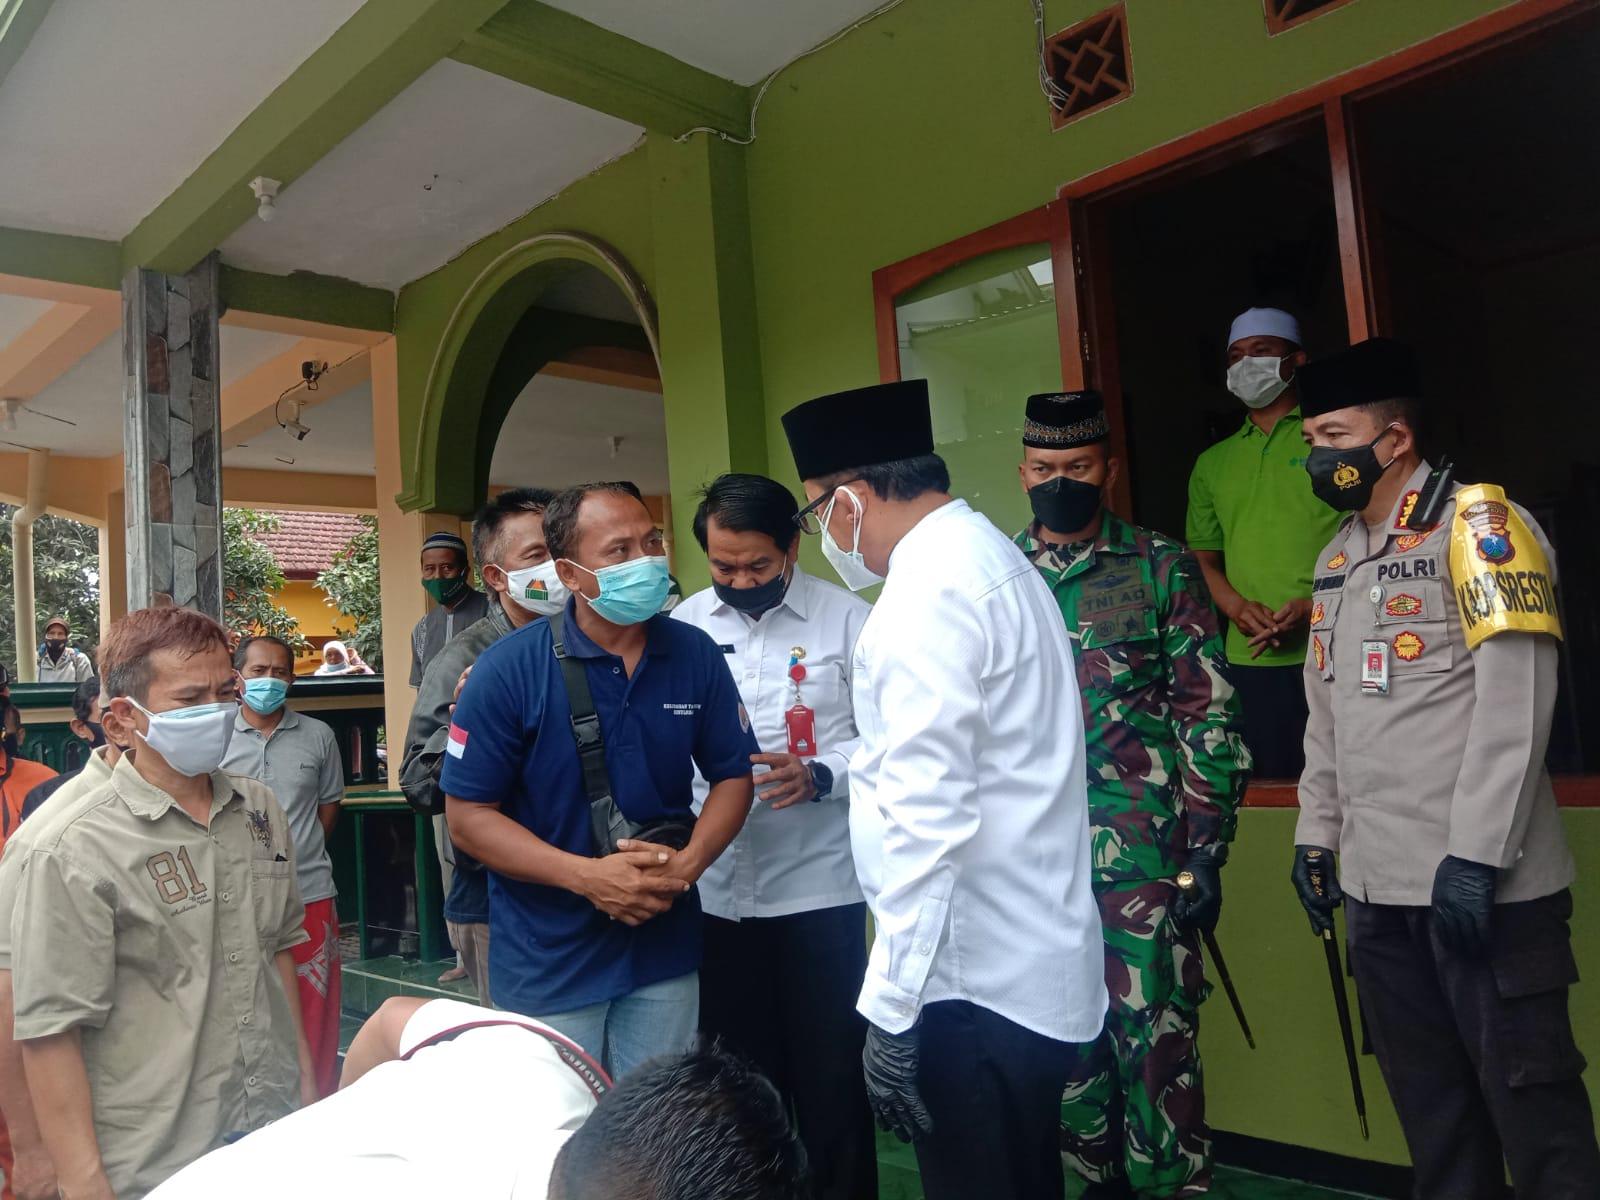 Wali Kota Malang Sutiaji sedang berkoordinasi dengan keluarga Roland Sumarna, korban plengsengan ambrol di Kota Malang, saat persiapan pemakaman jenazah. (Foto: Feni Yusnia/Tugu Malang)